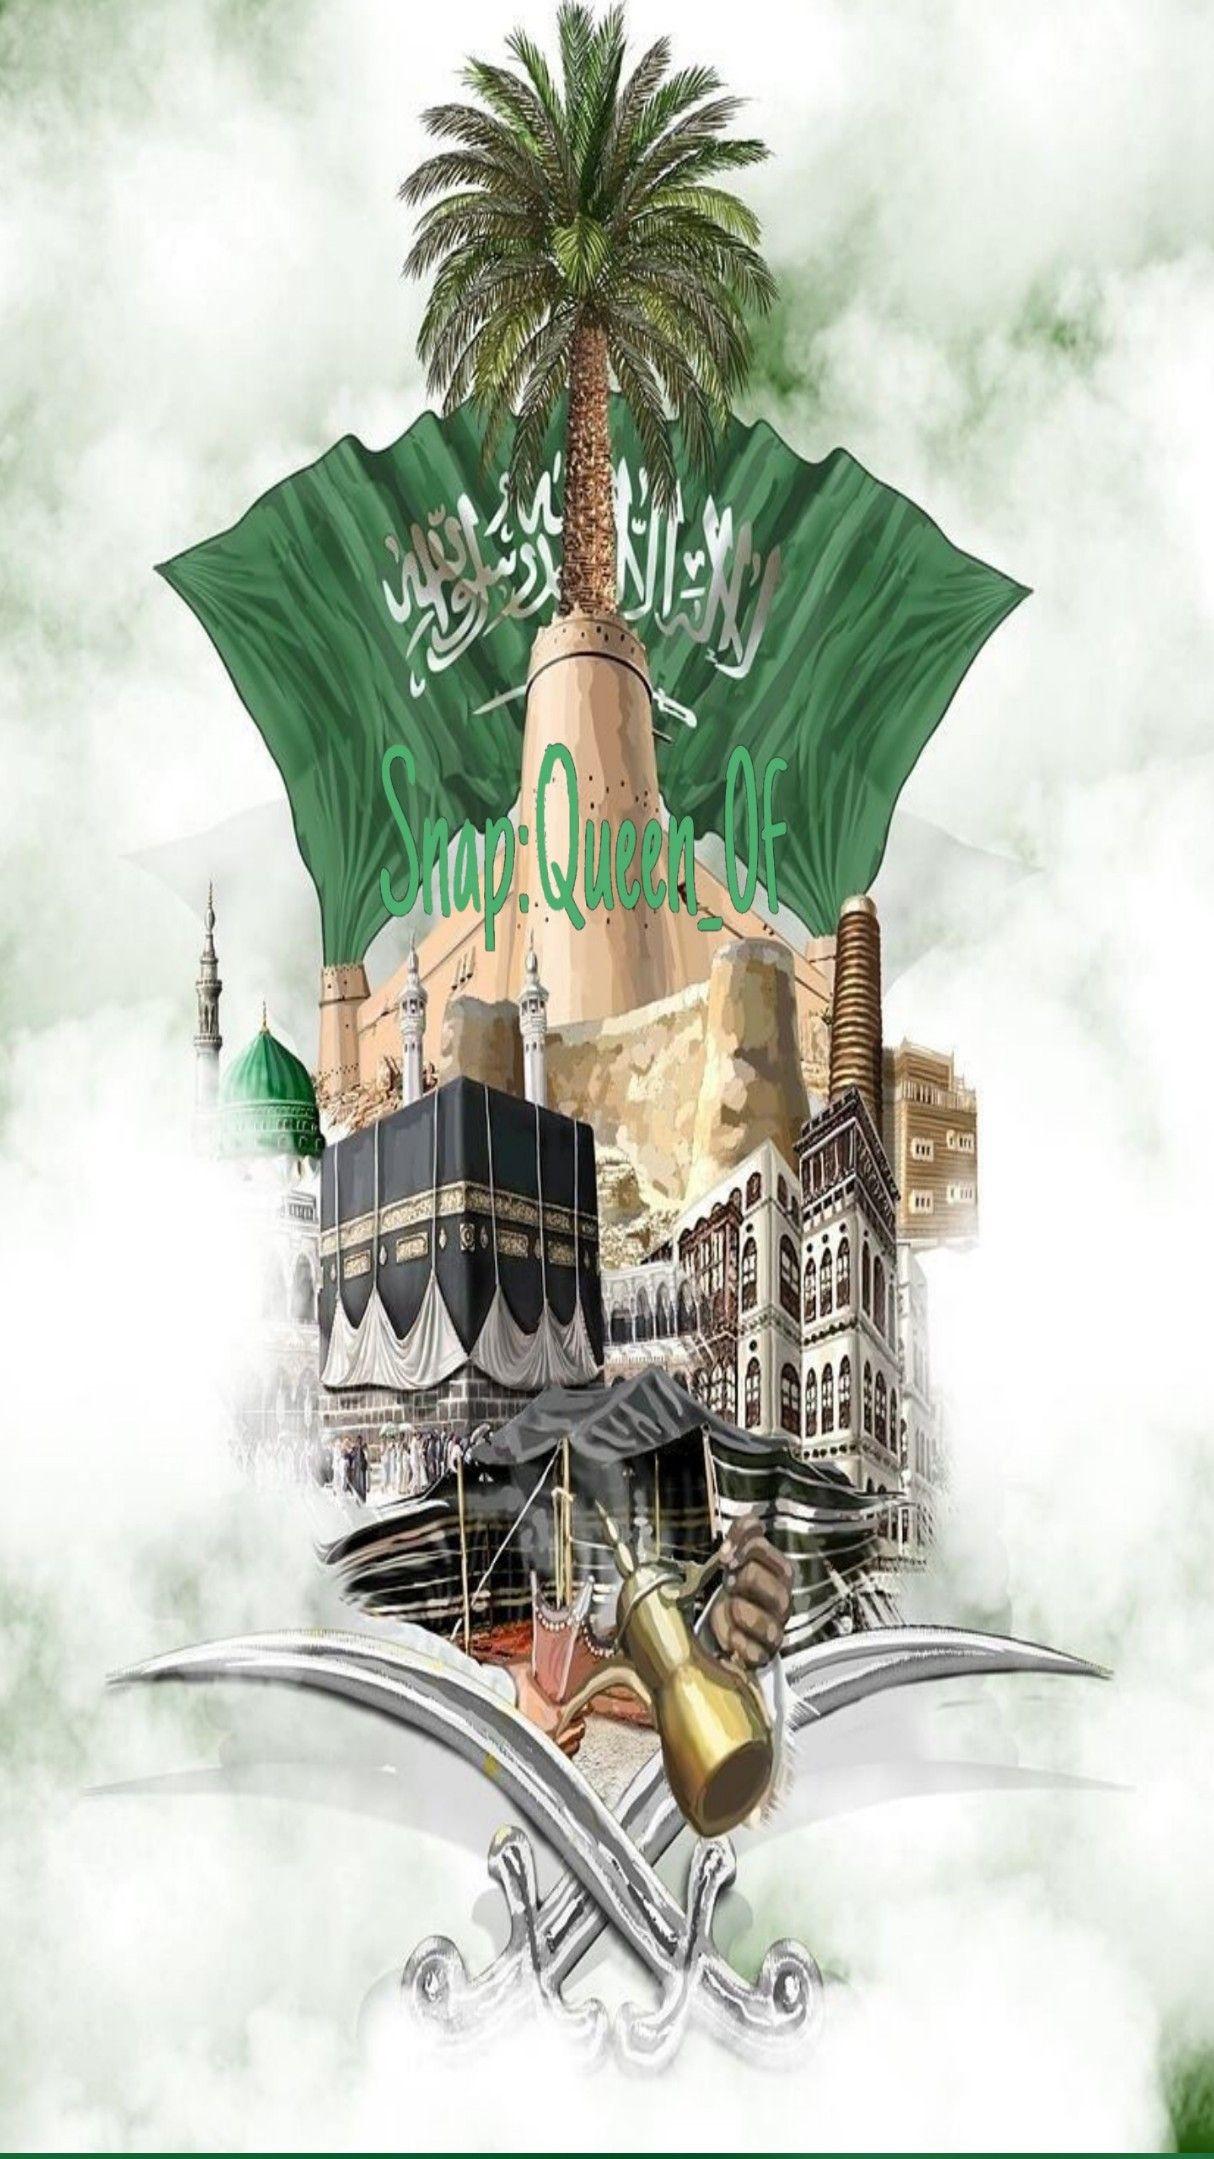 Pin By Zahid Iqbal On سناب شات سنابي تابعوني National Day Saudi Saudi Flag Saudi Arabia Flag